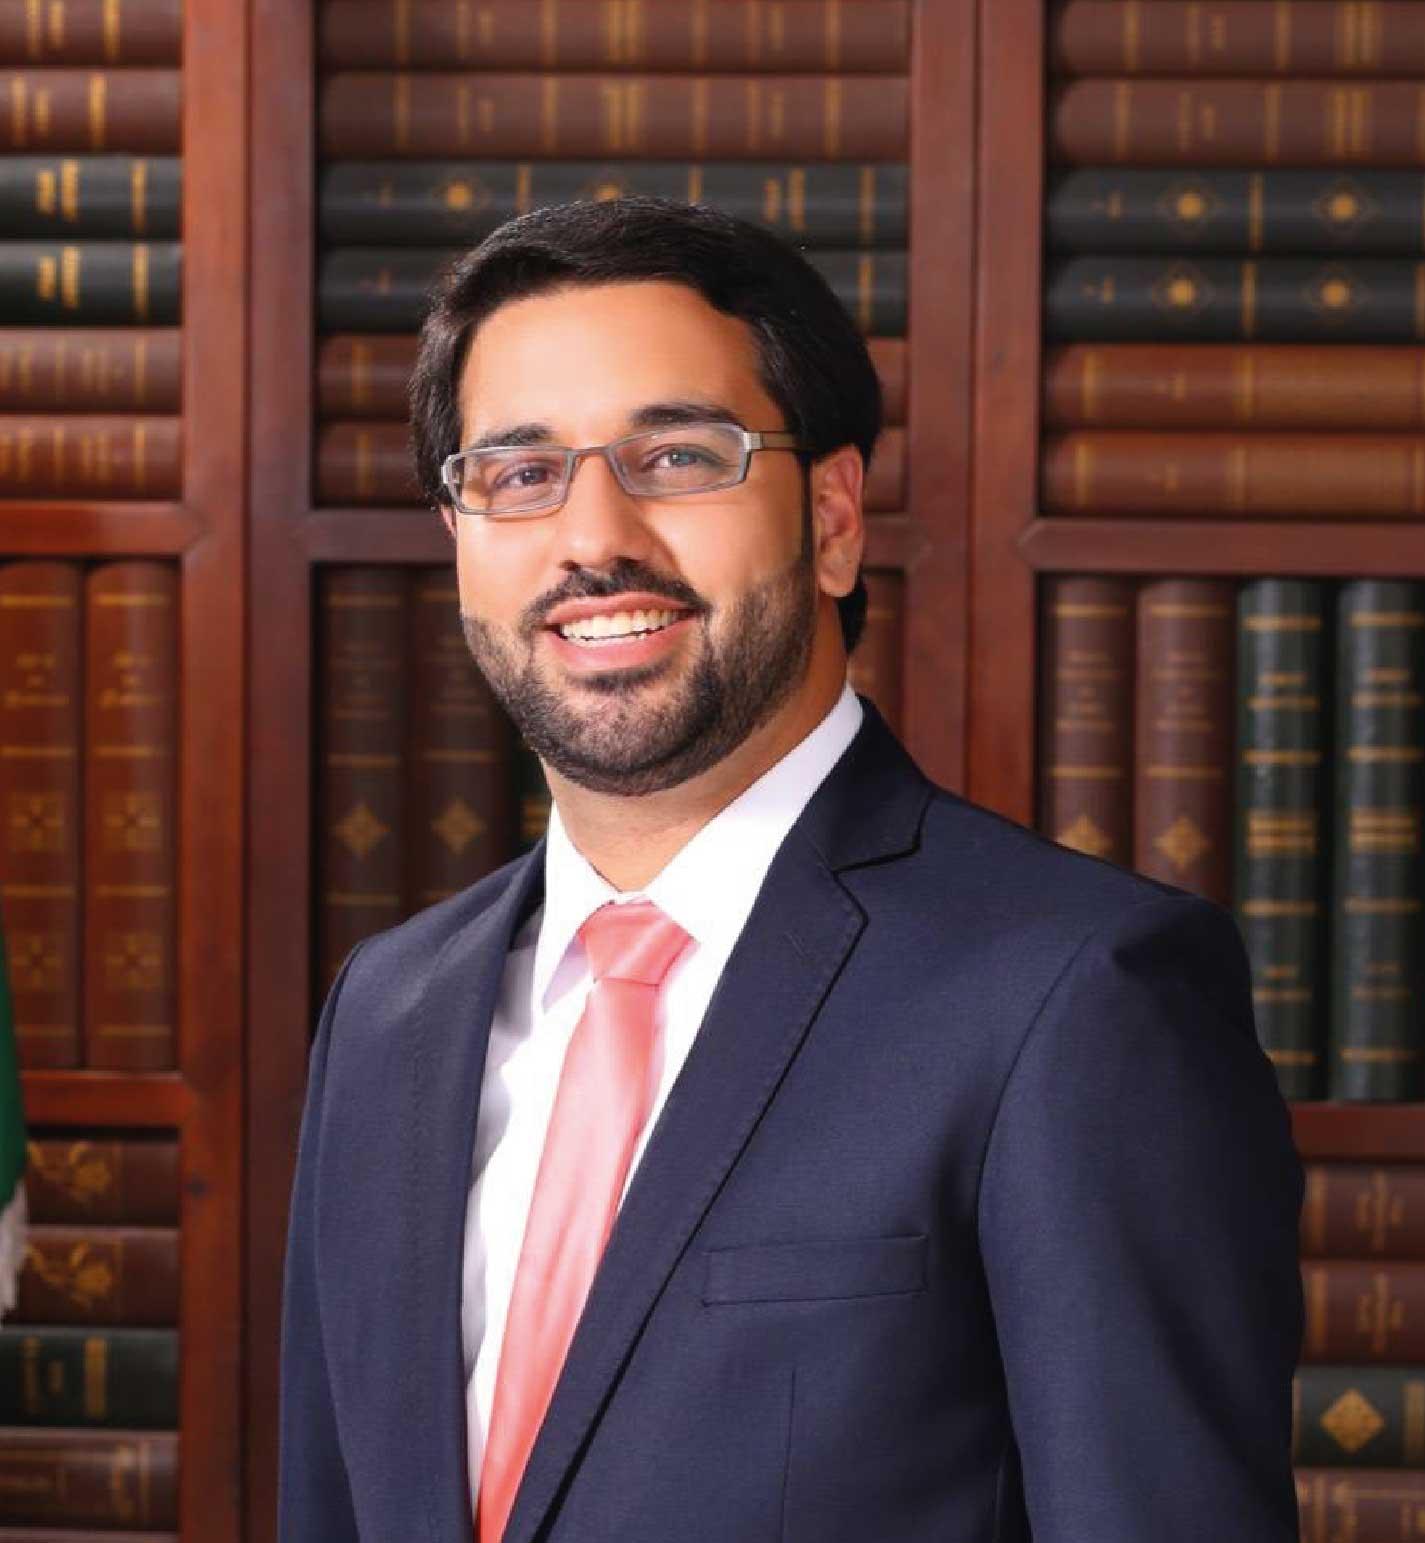 Eng. Adel Ghanem